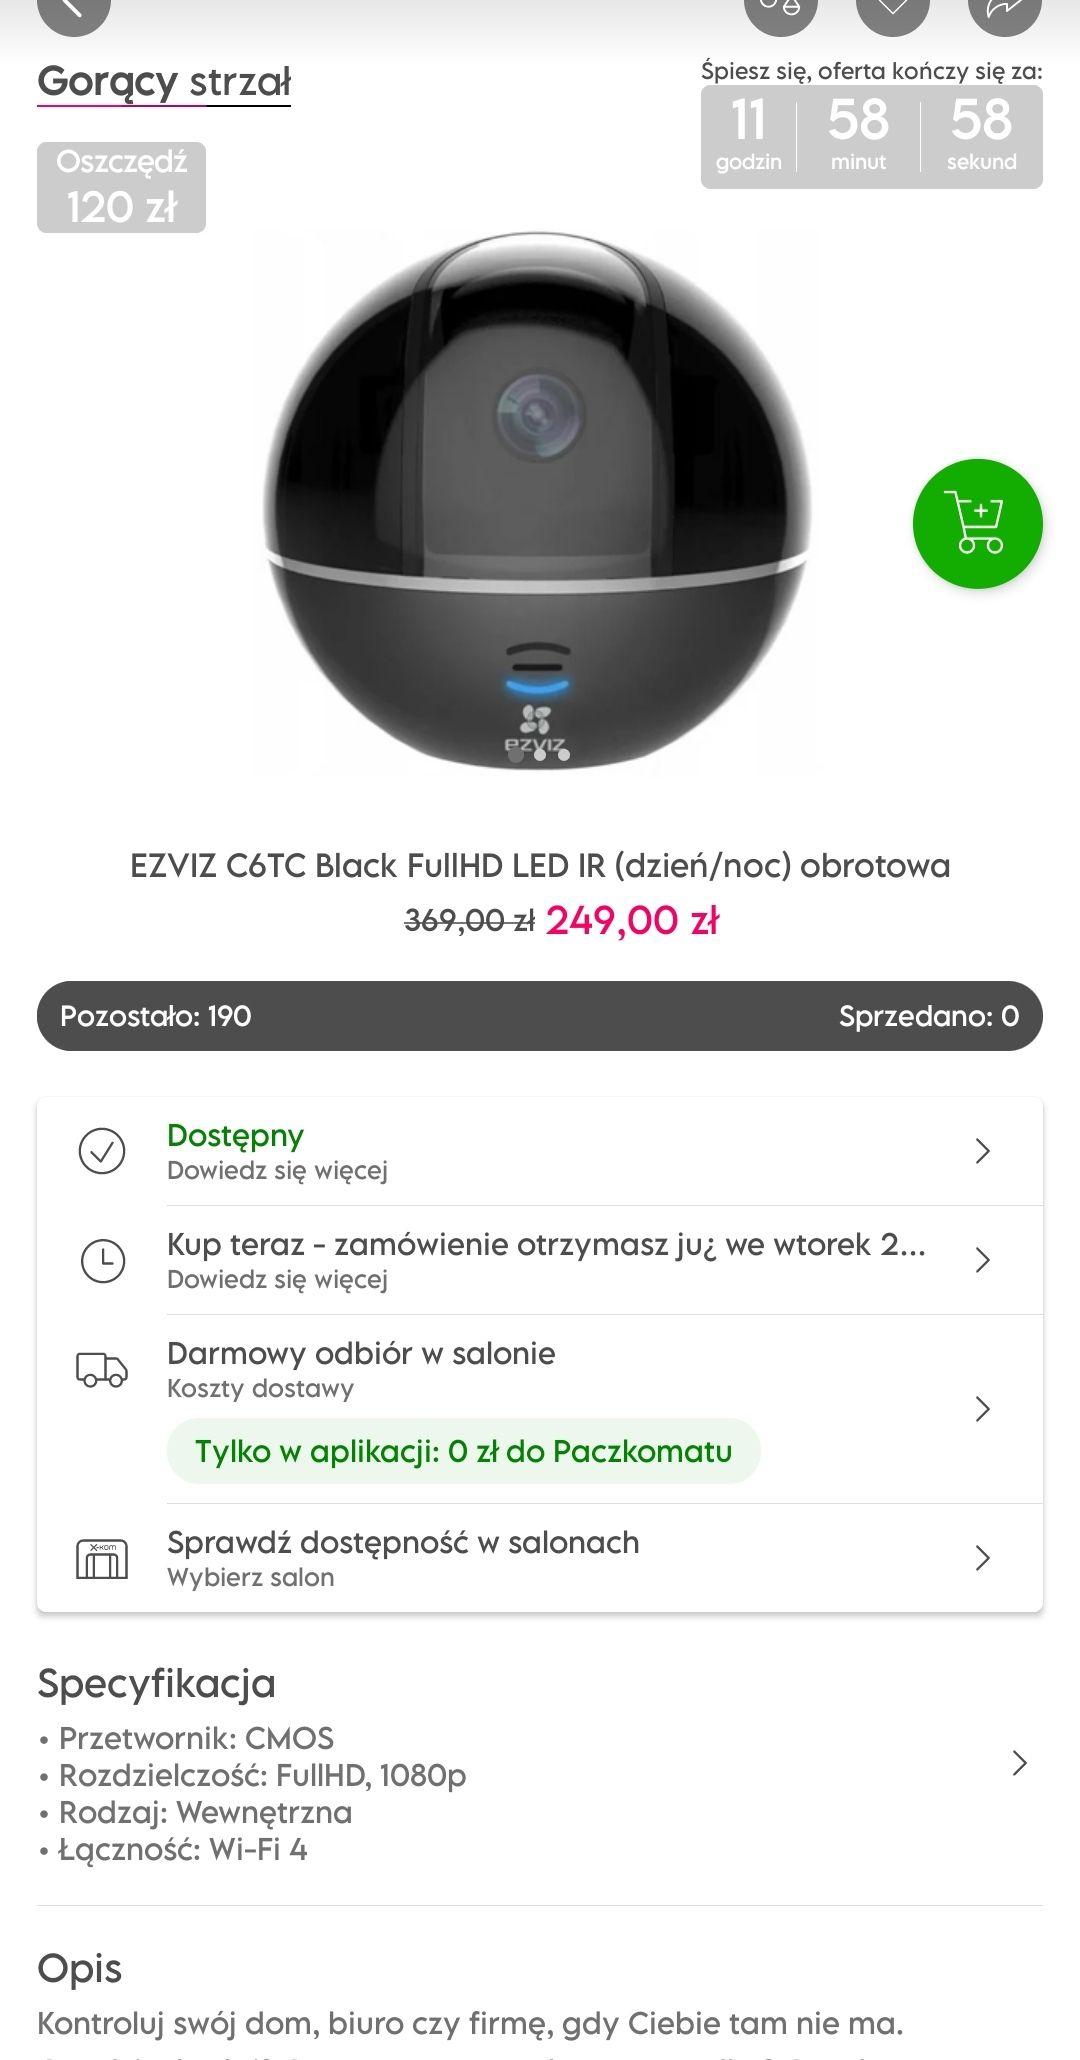 Kamera EZVIZ C6TC Black FullHD LED IR